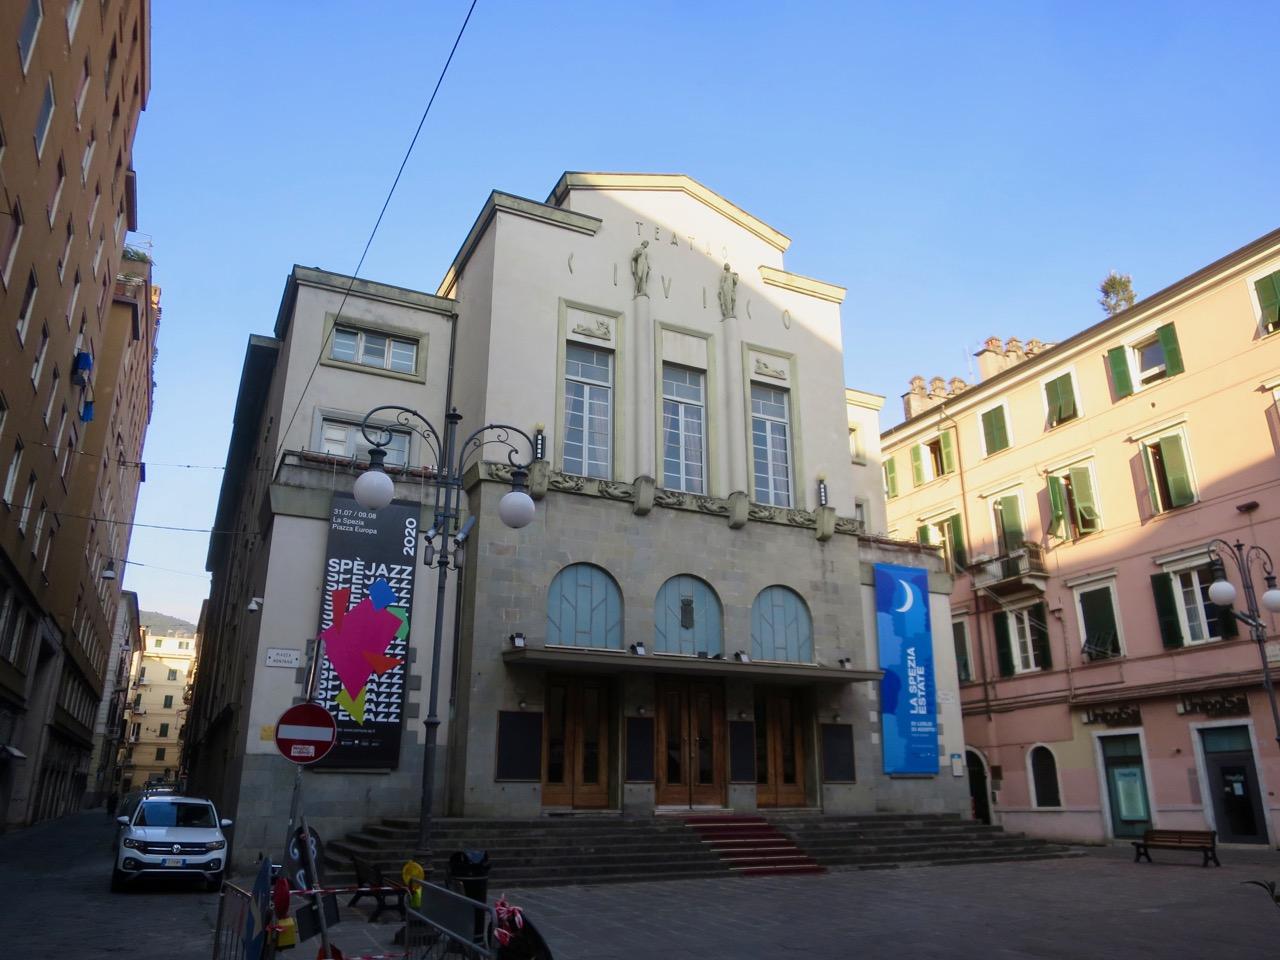 La Spezia 1 17